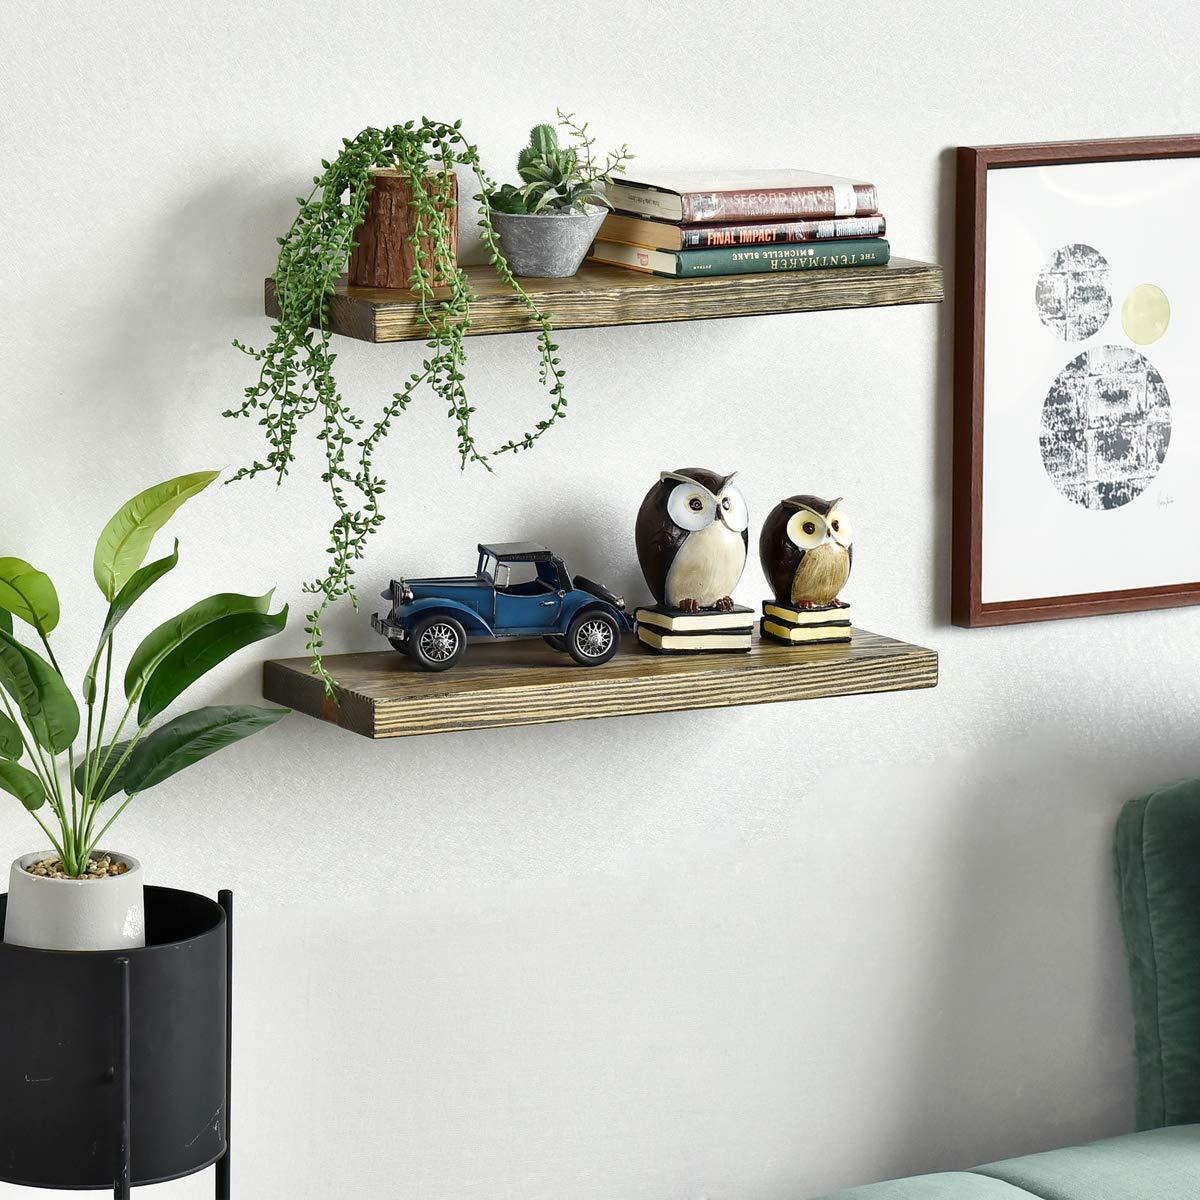 Set of 2, 24 inch WELLAND Allen 8 Deep Floating Shelves Set of 2 Reclaimed Wood Wall Shelf Rustic Pine Wall Mount Shelf